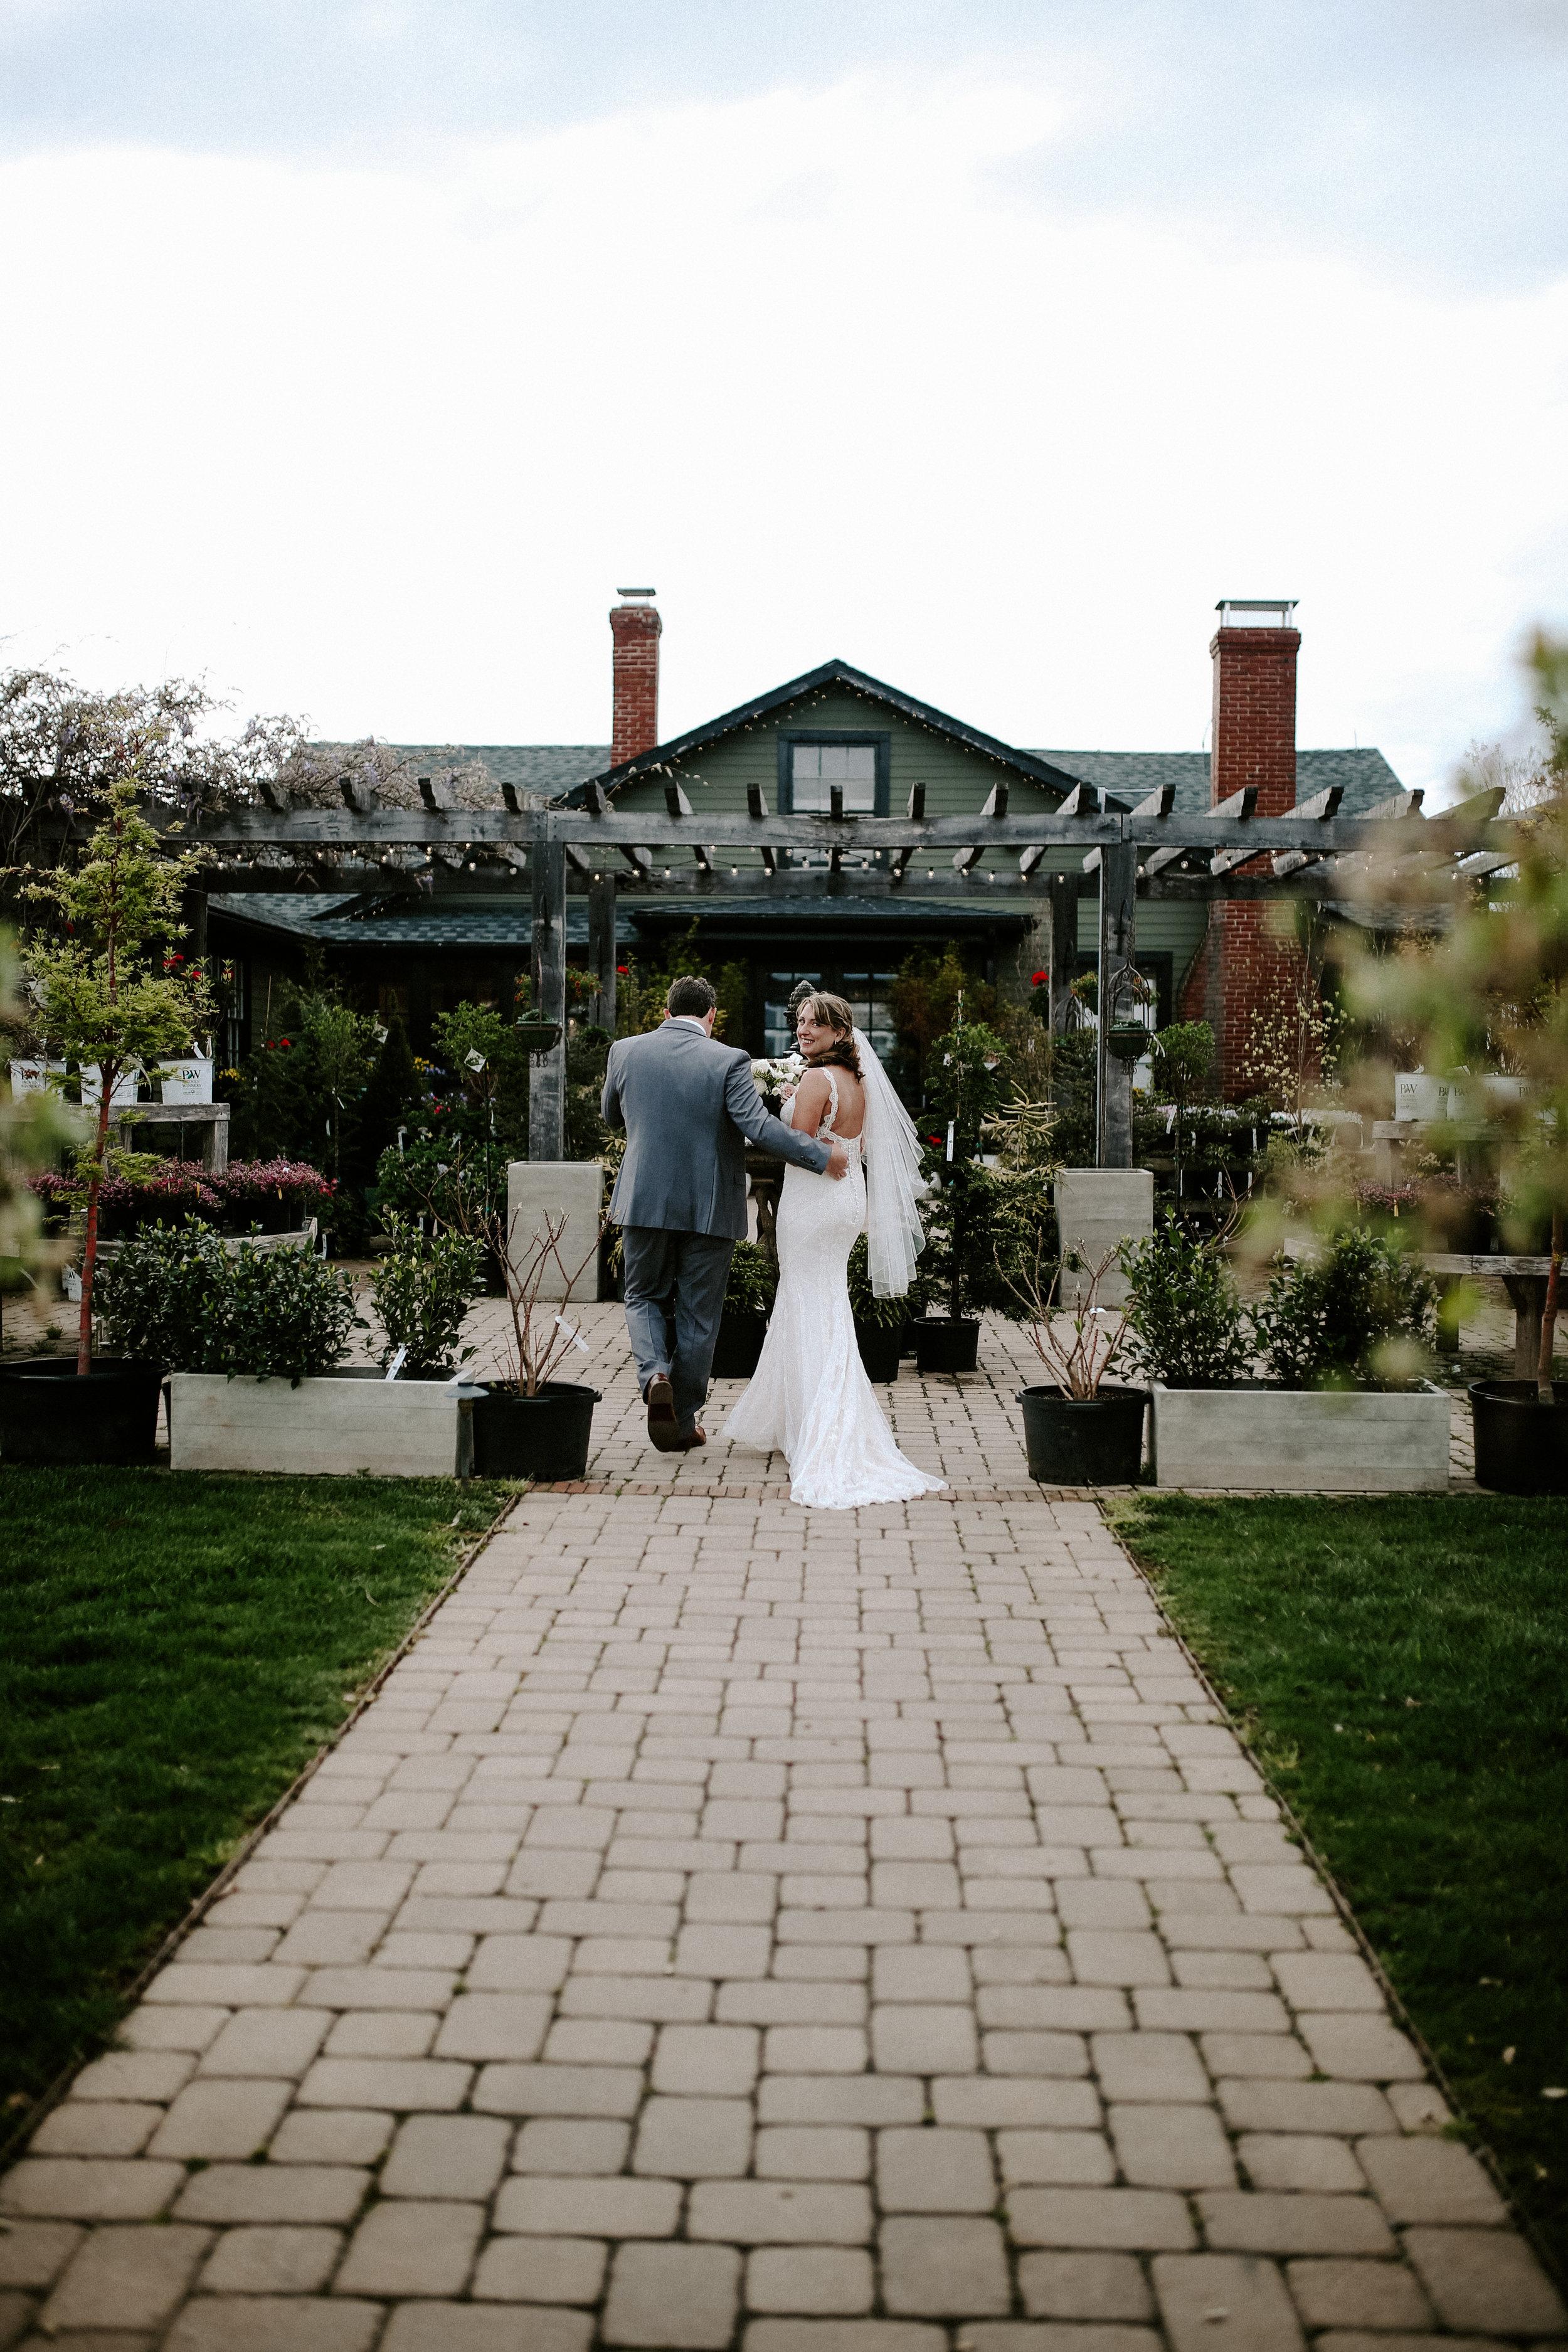 TheGreens_Married_2019-360.jpg